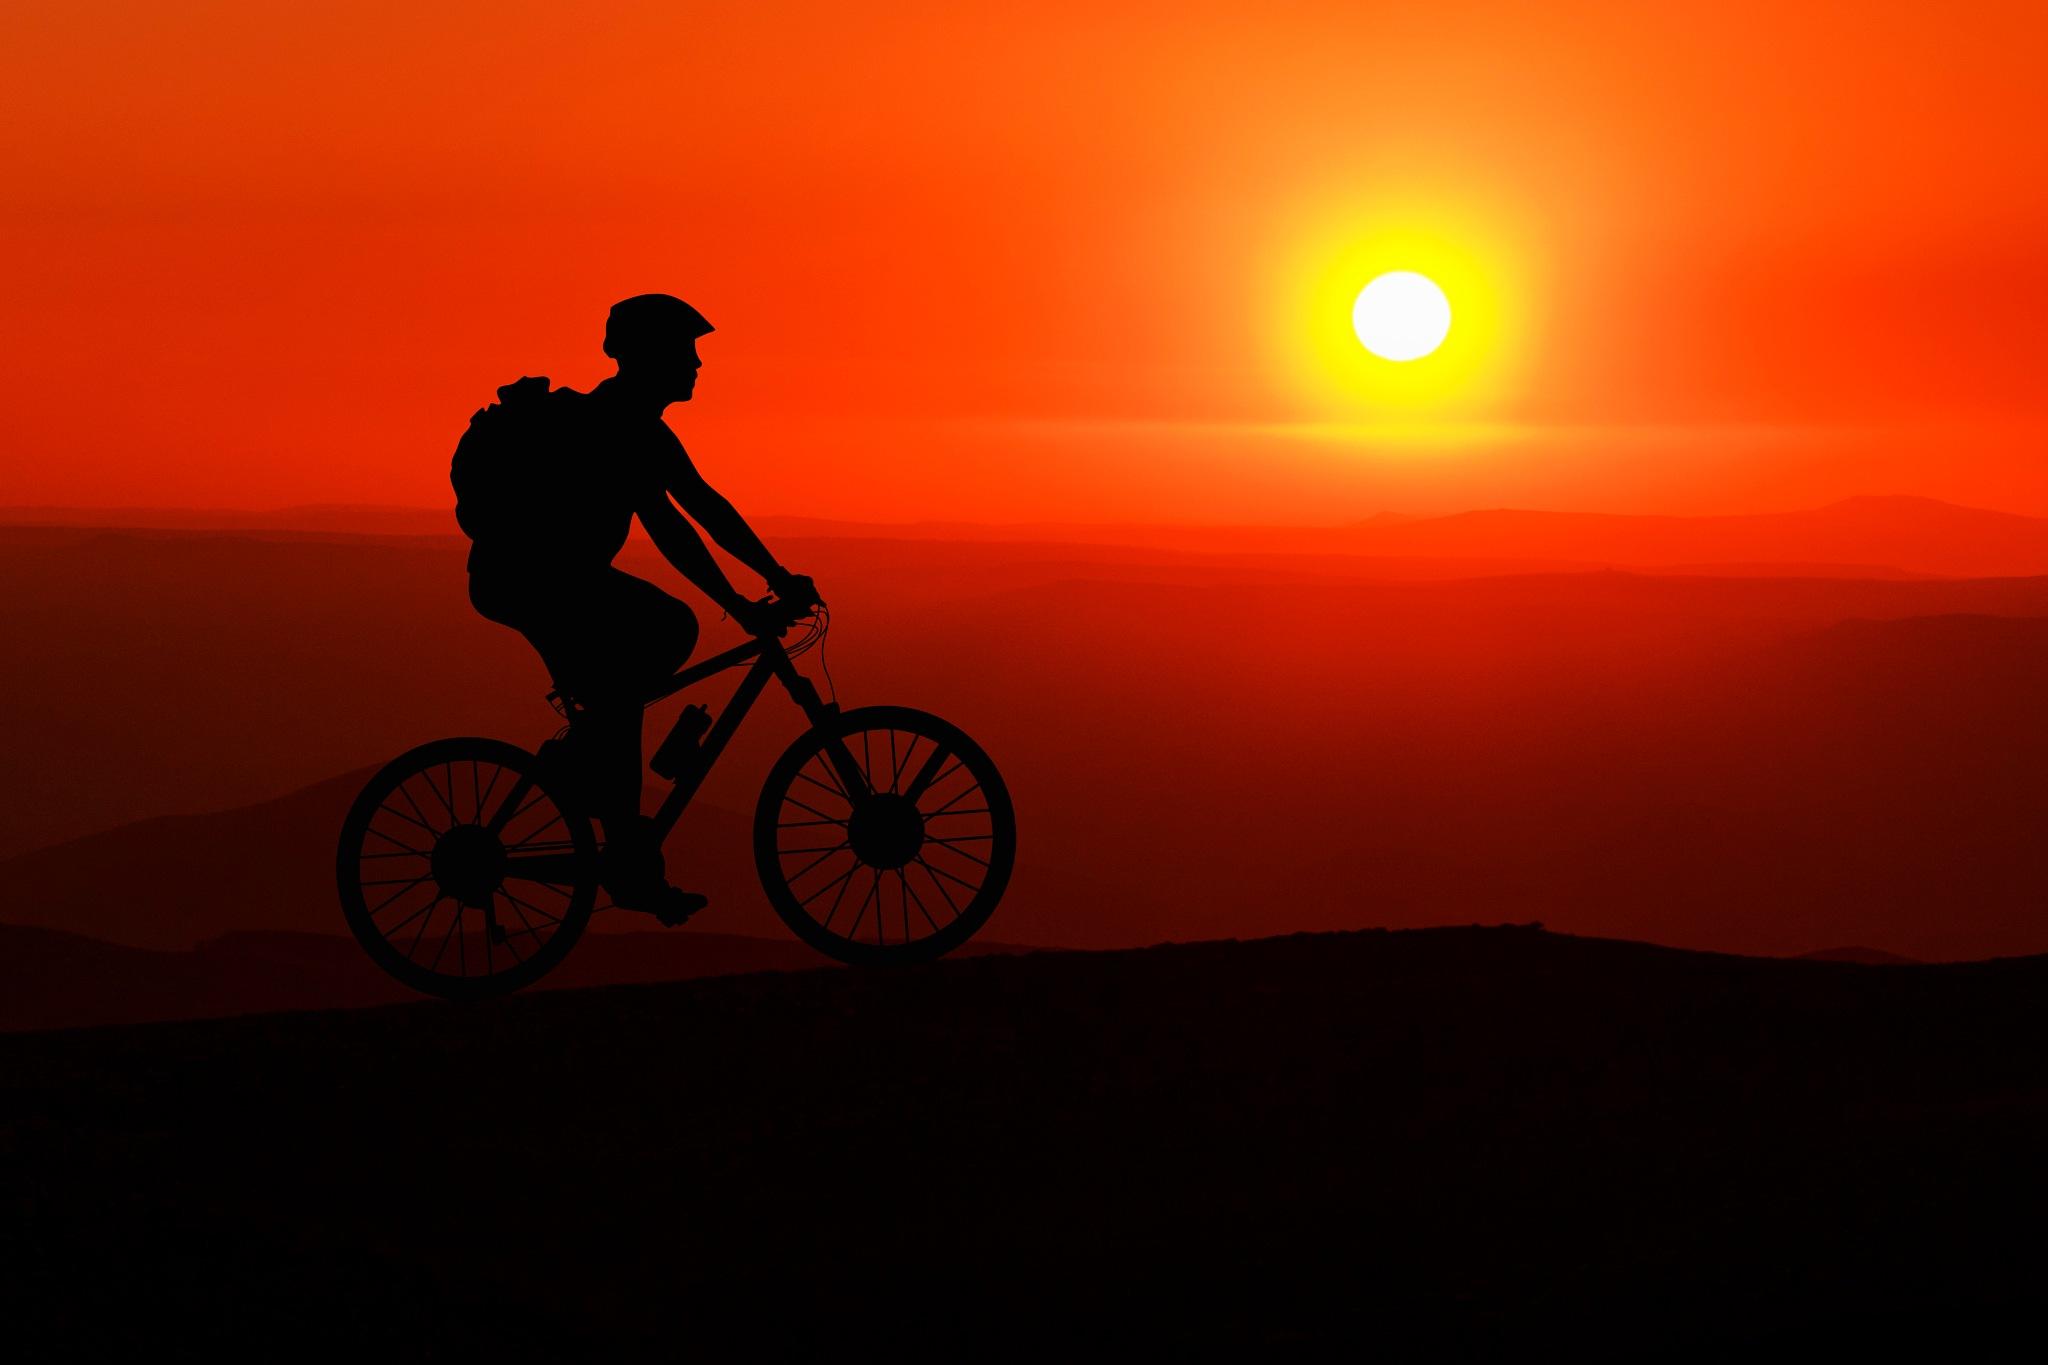 Red sunset by Noureddine Belfethi